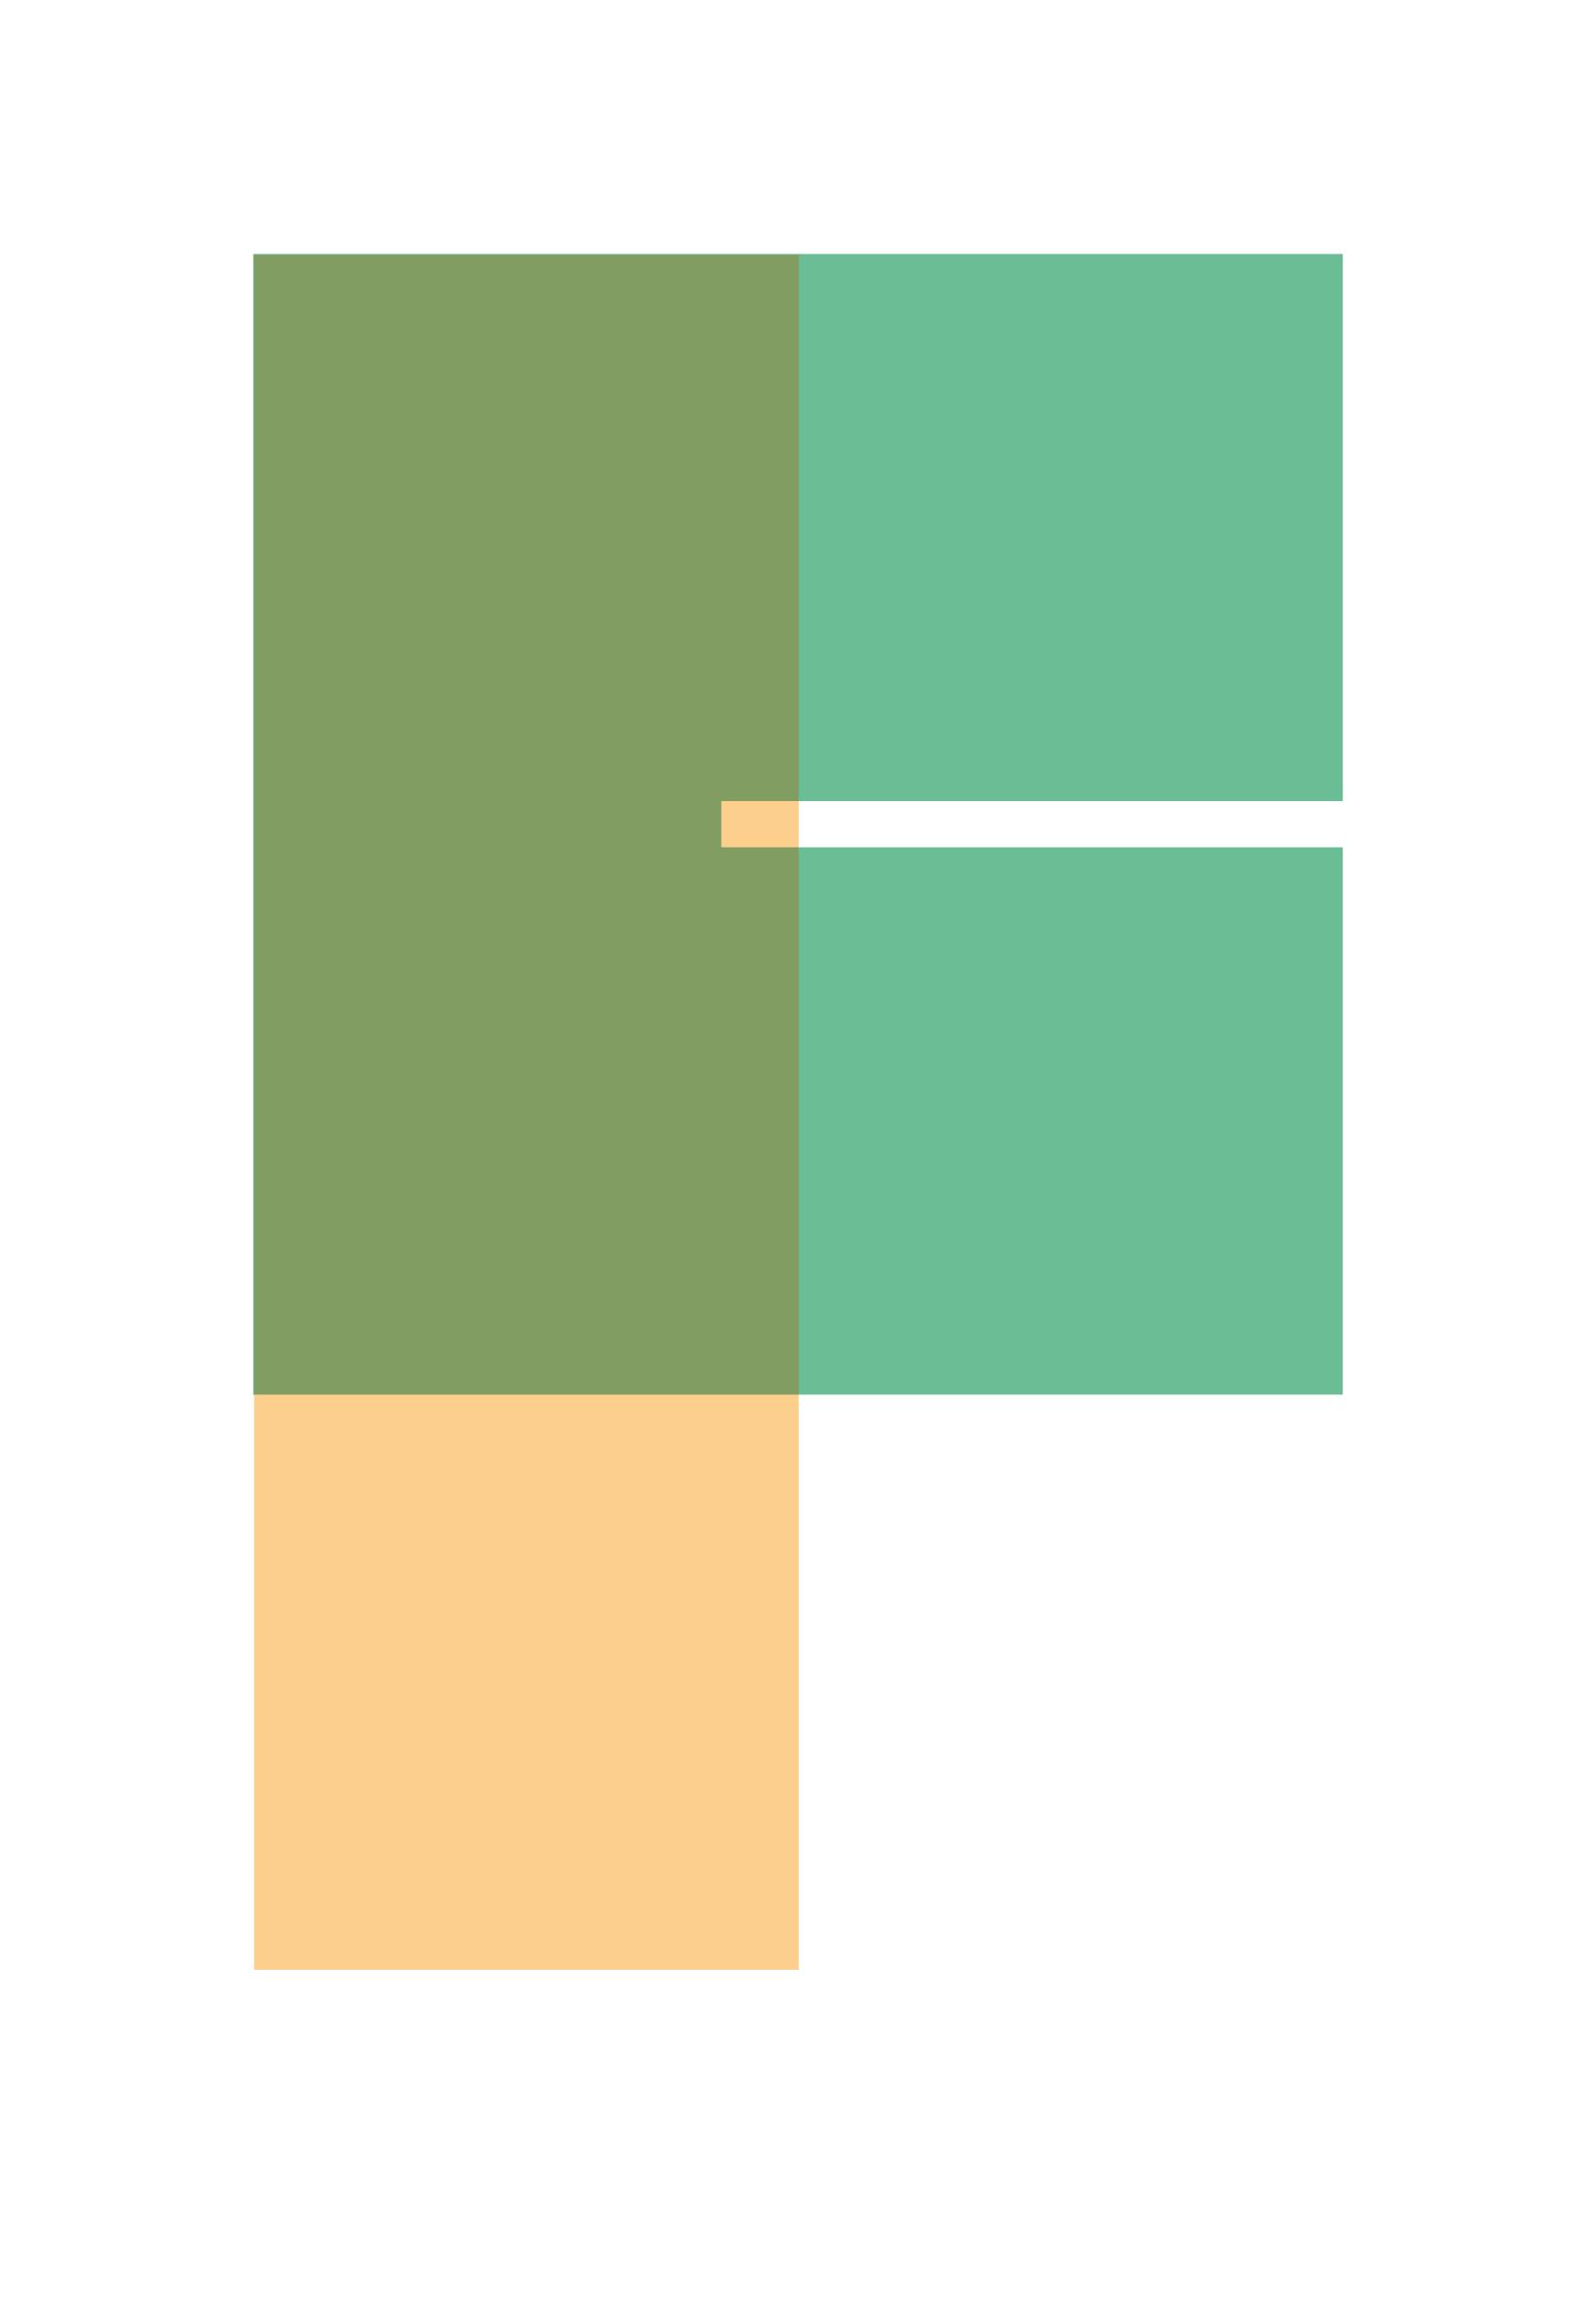 knitcon_alpha6.jpg